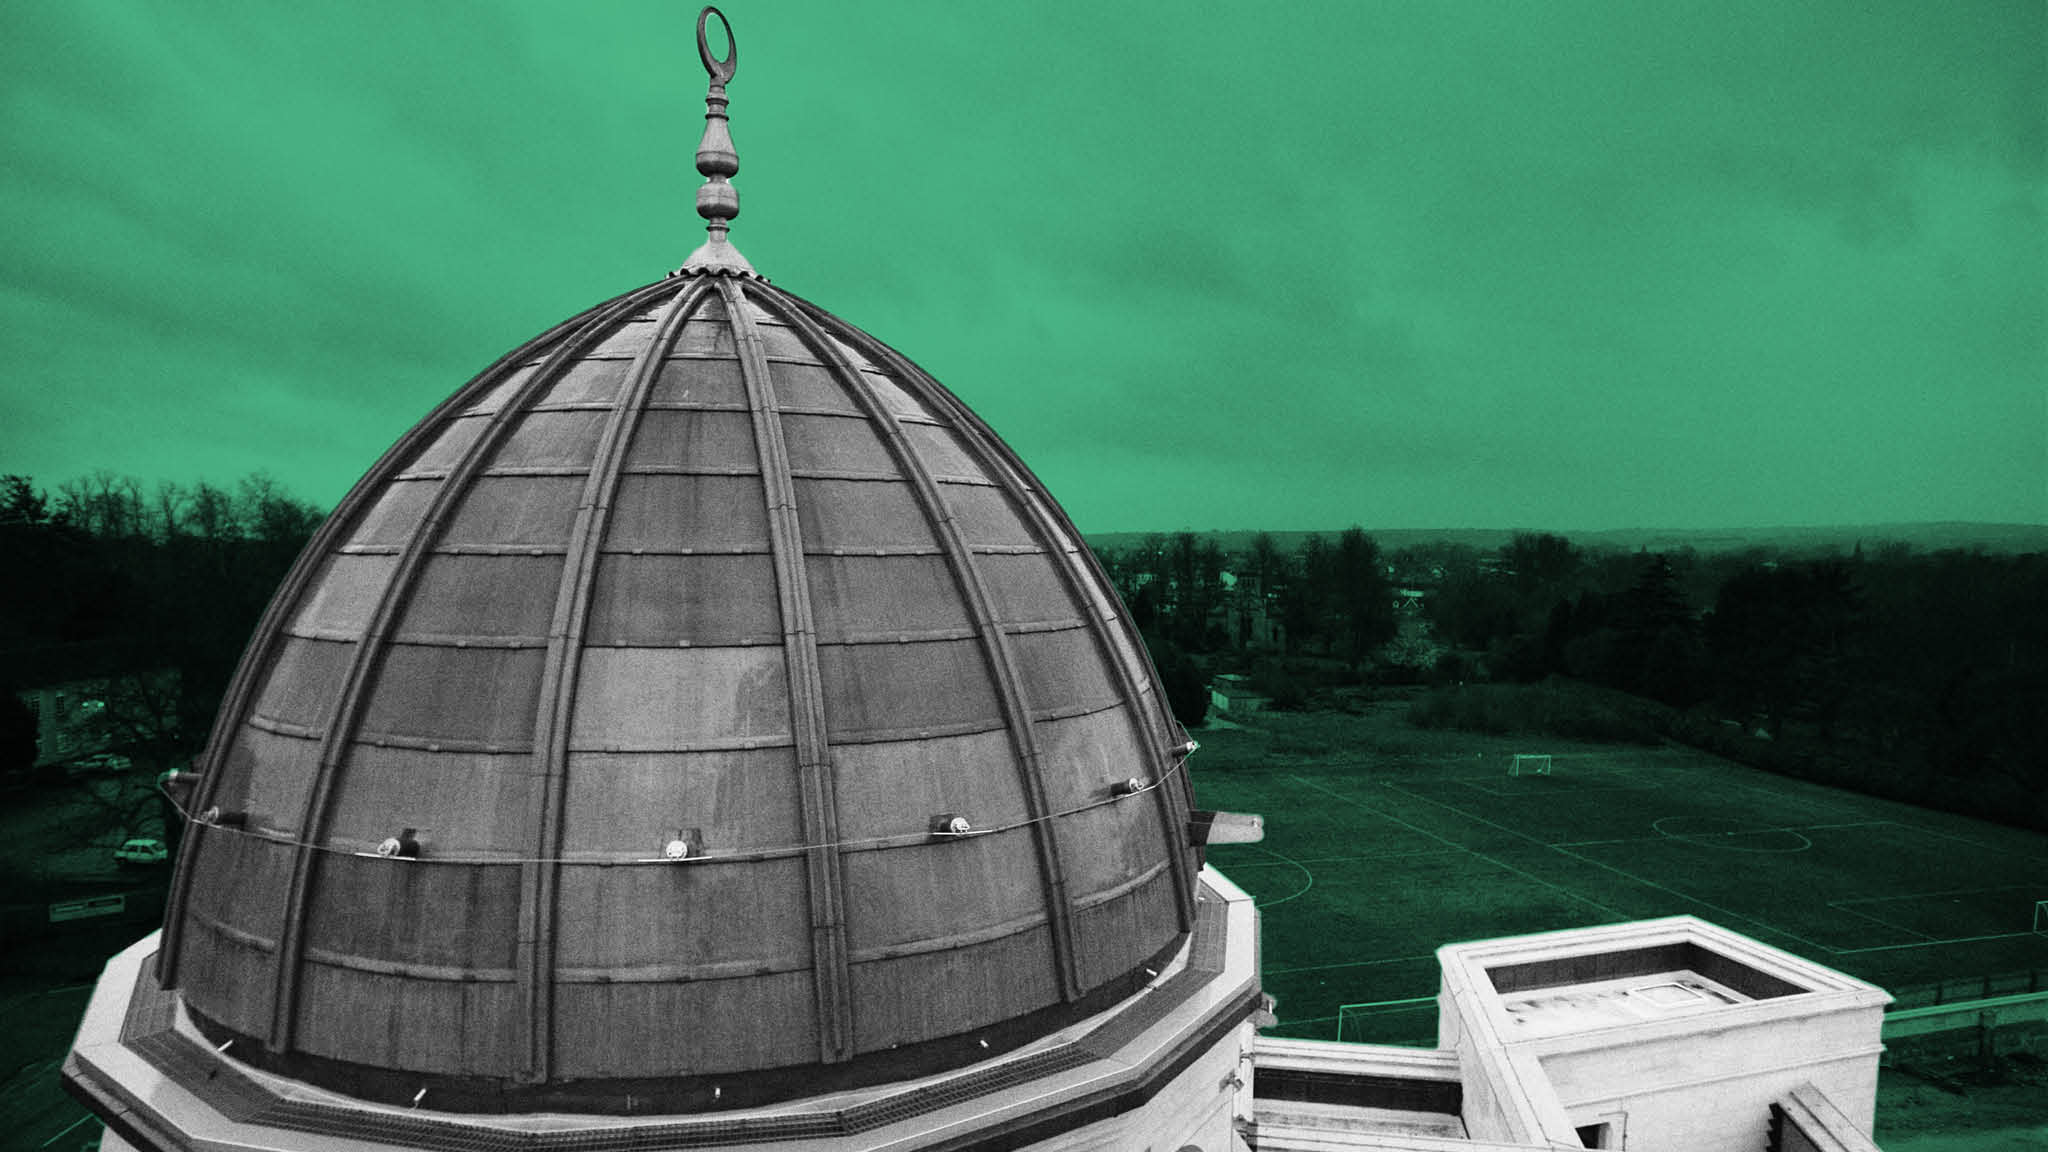 Universities challenged: scrutiny over Gulf money